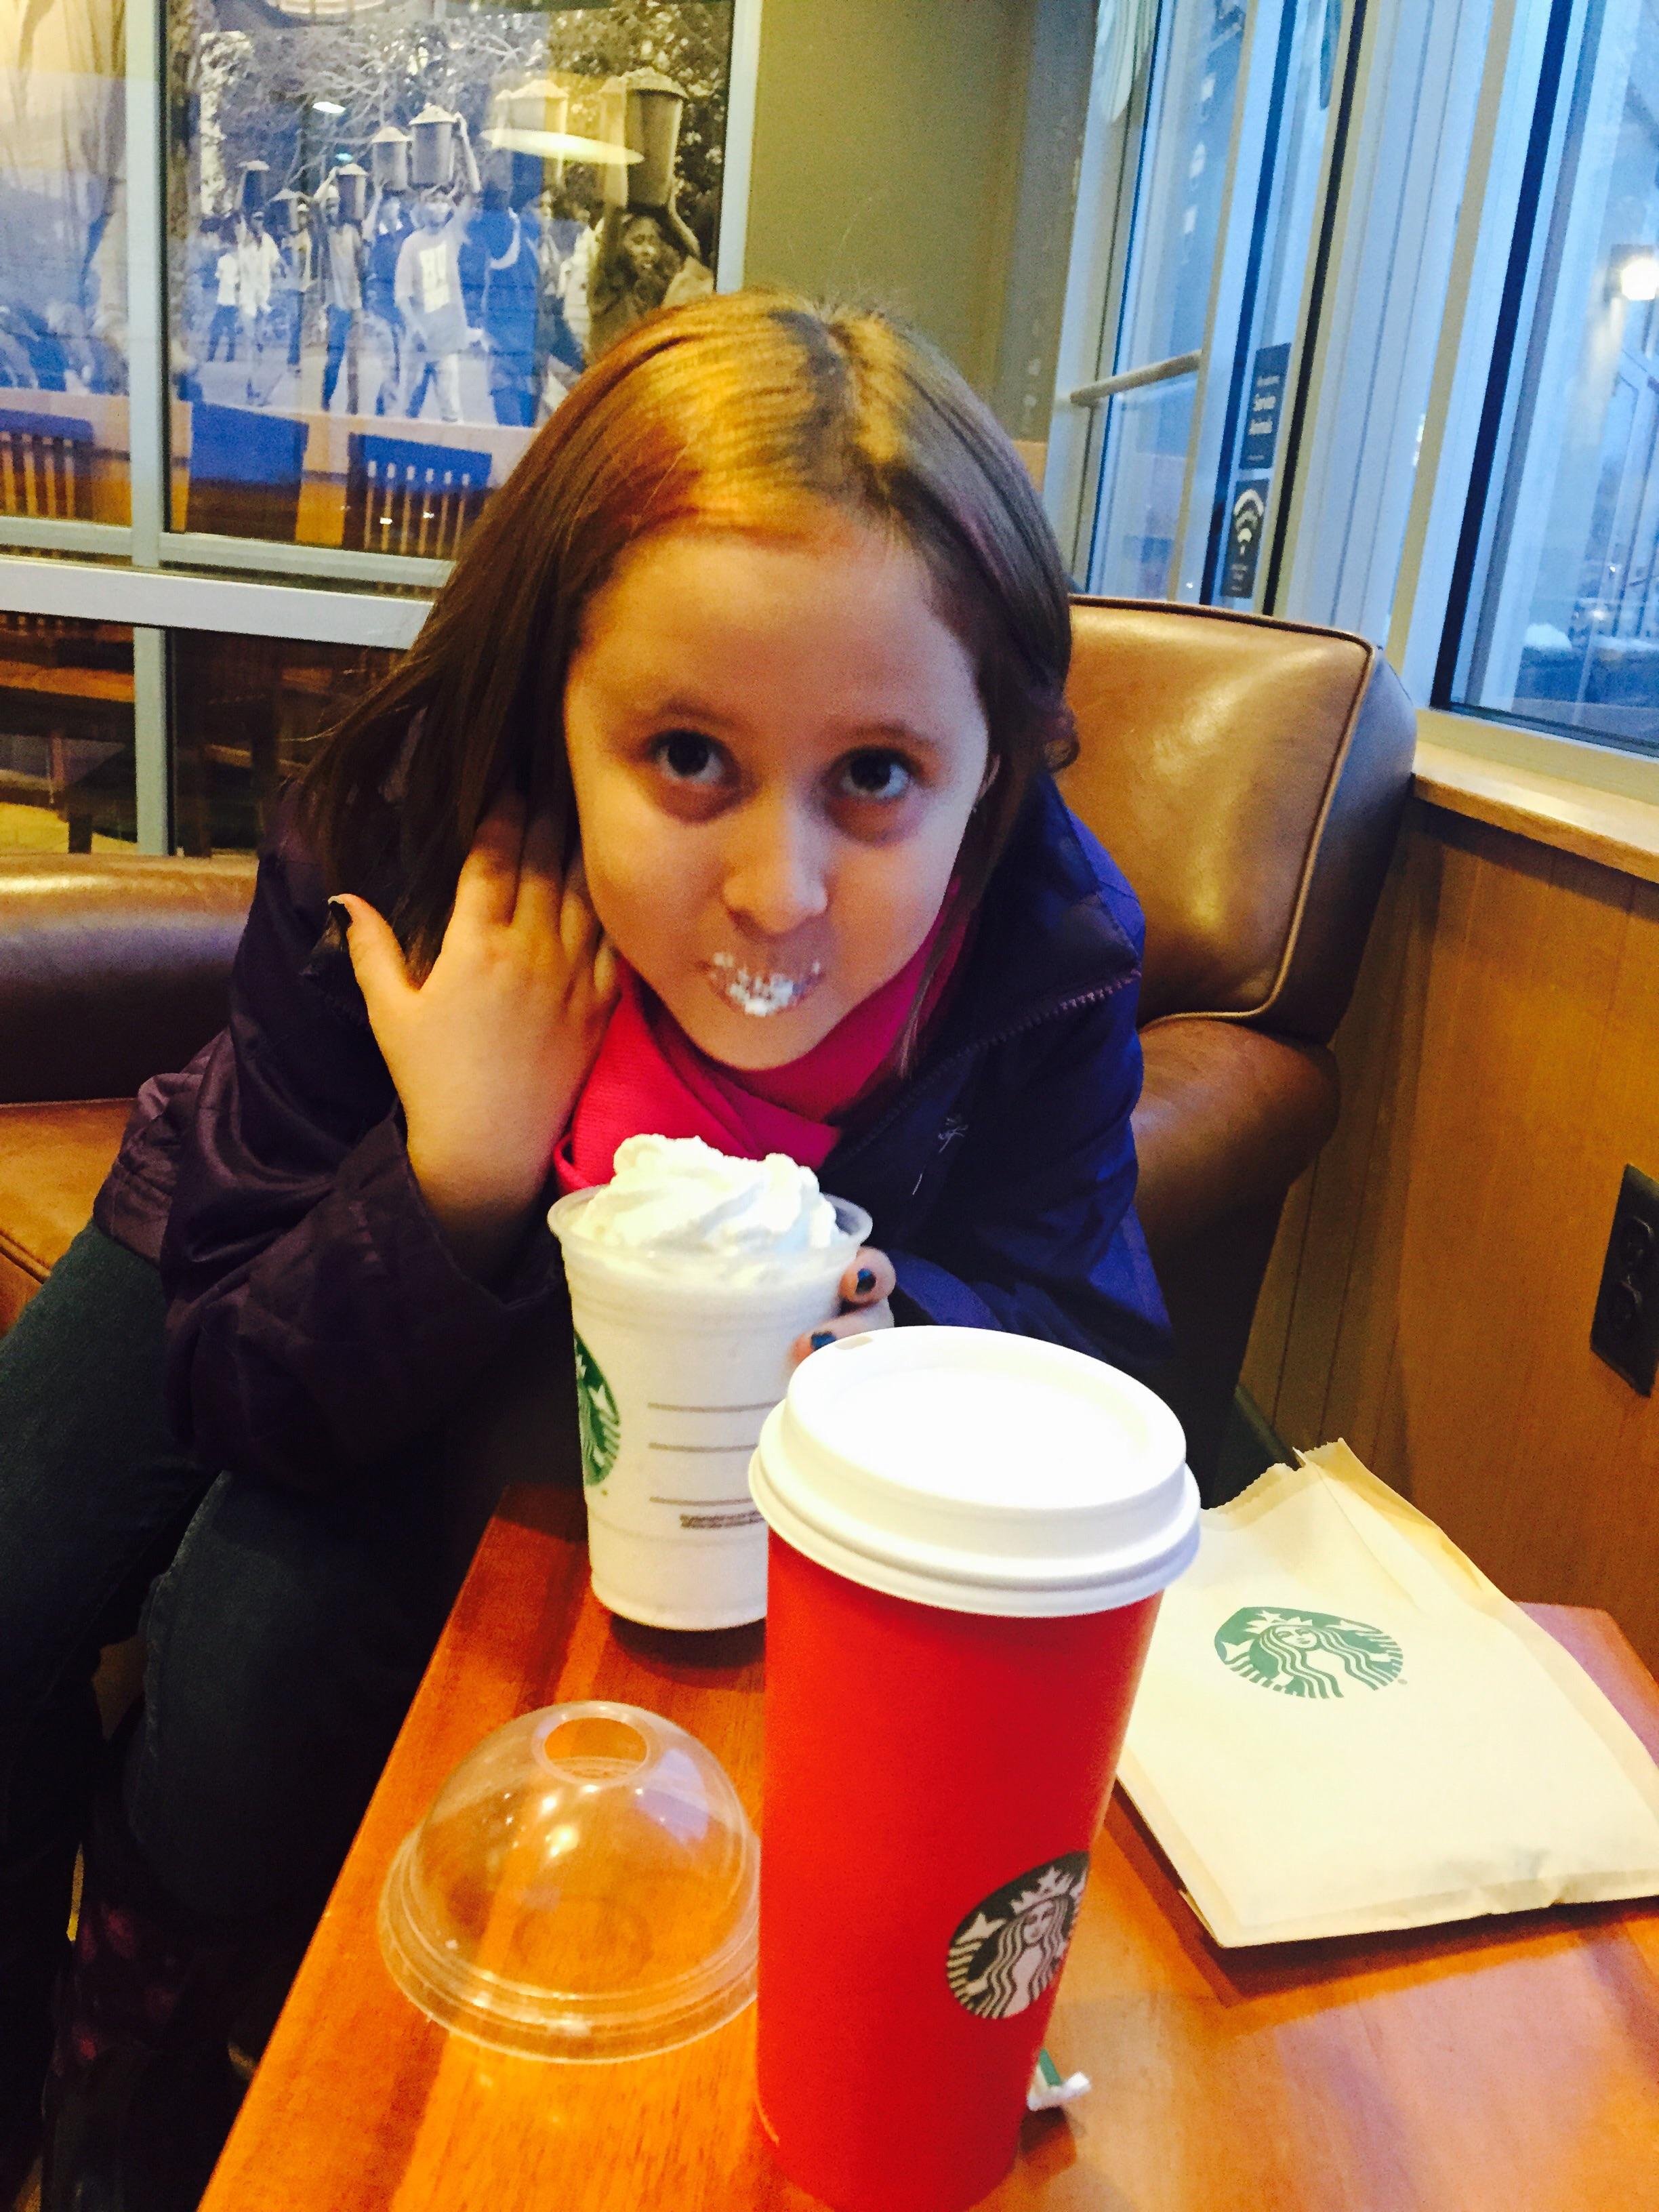 Miss Avalon enjoying her Starbucks treat.